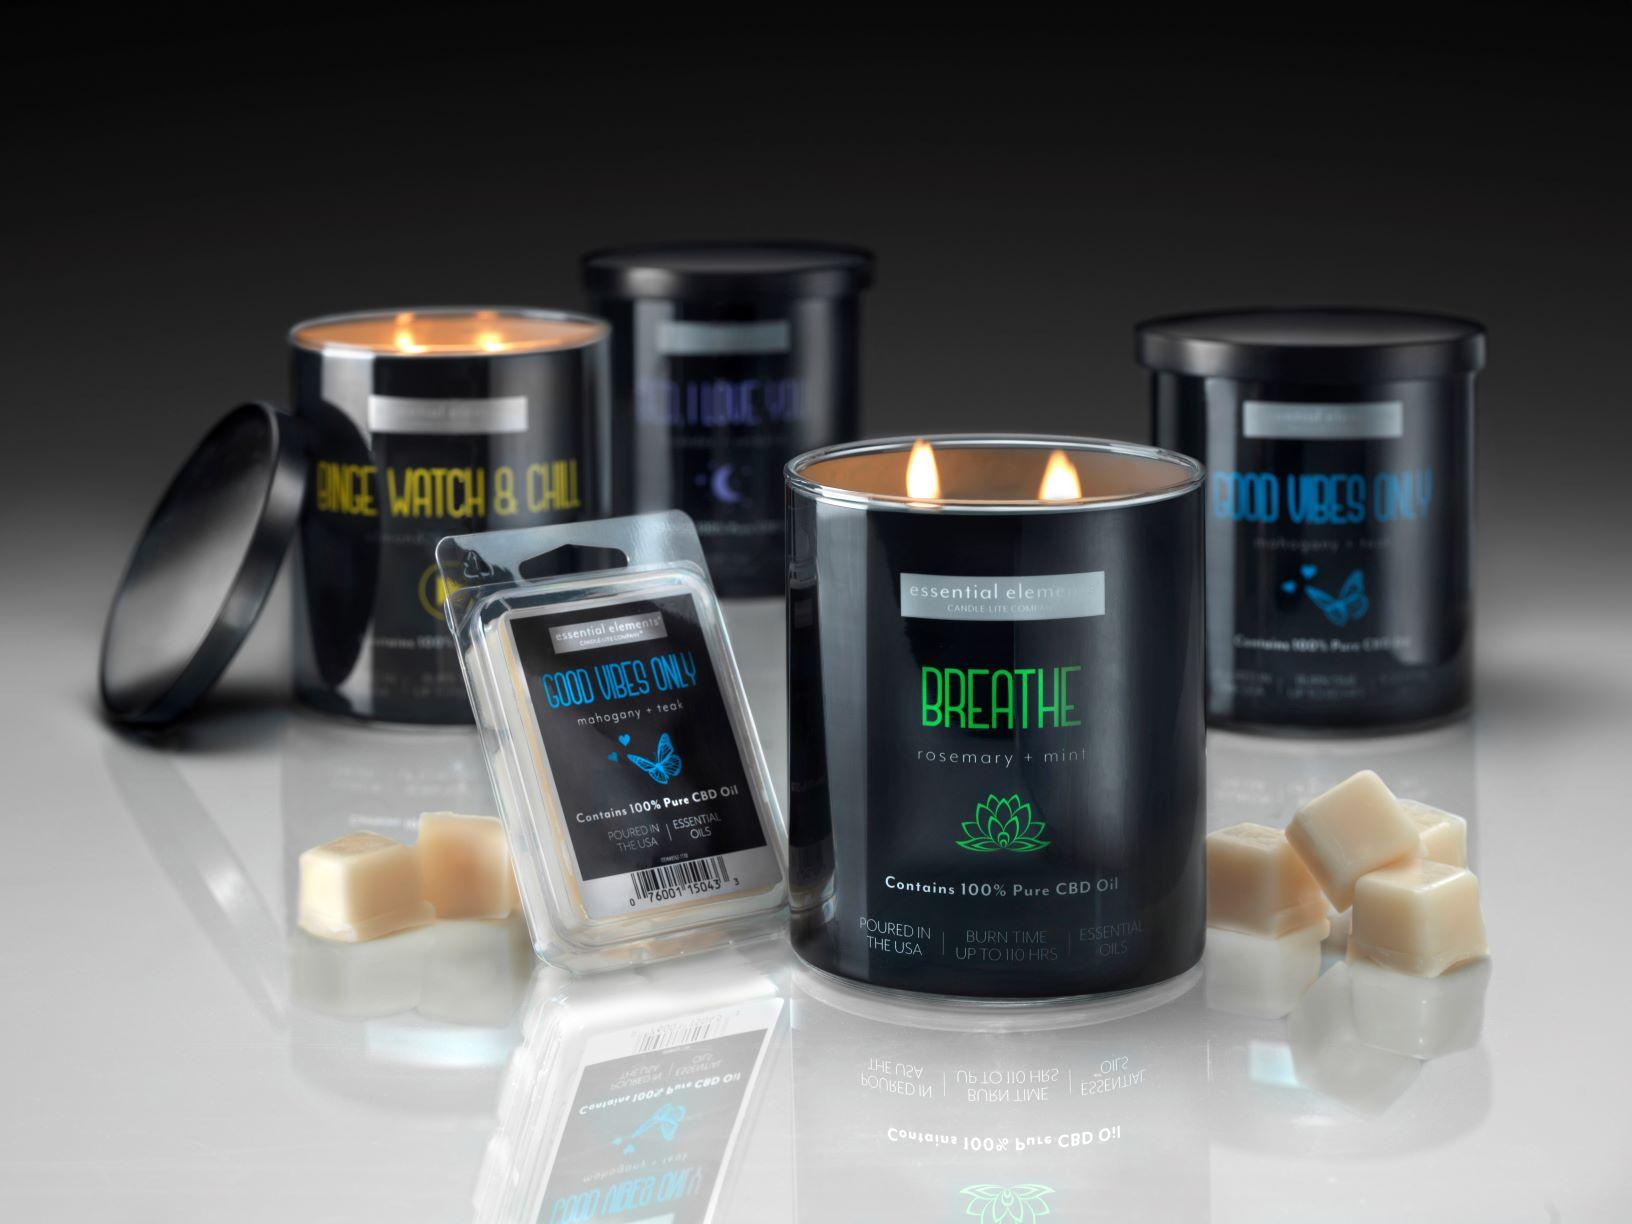 Candle-lite Company header image